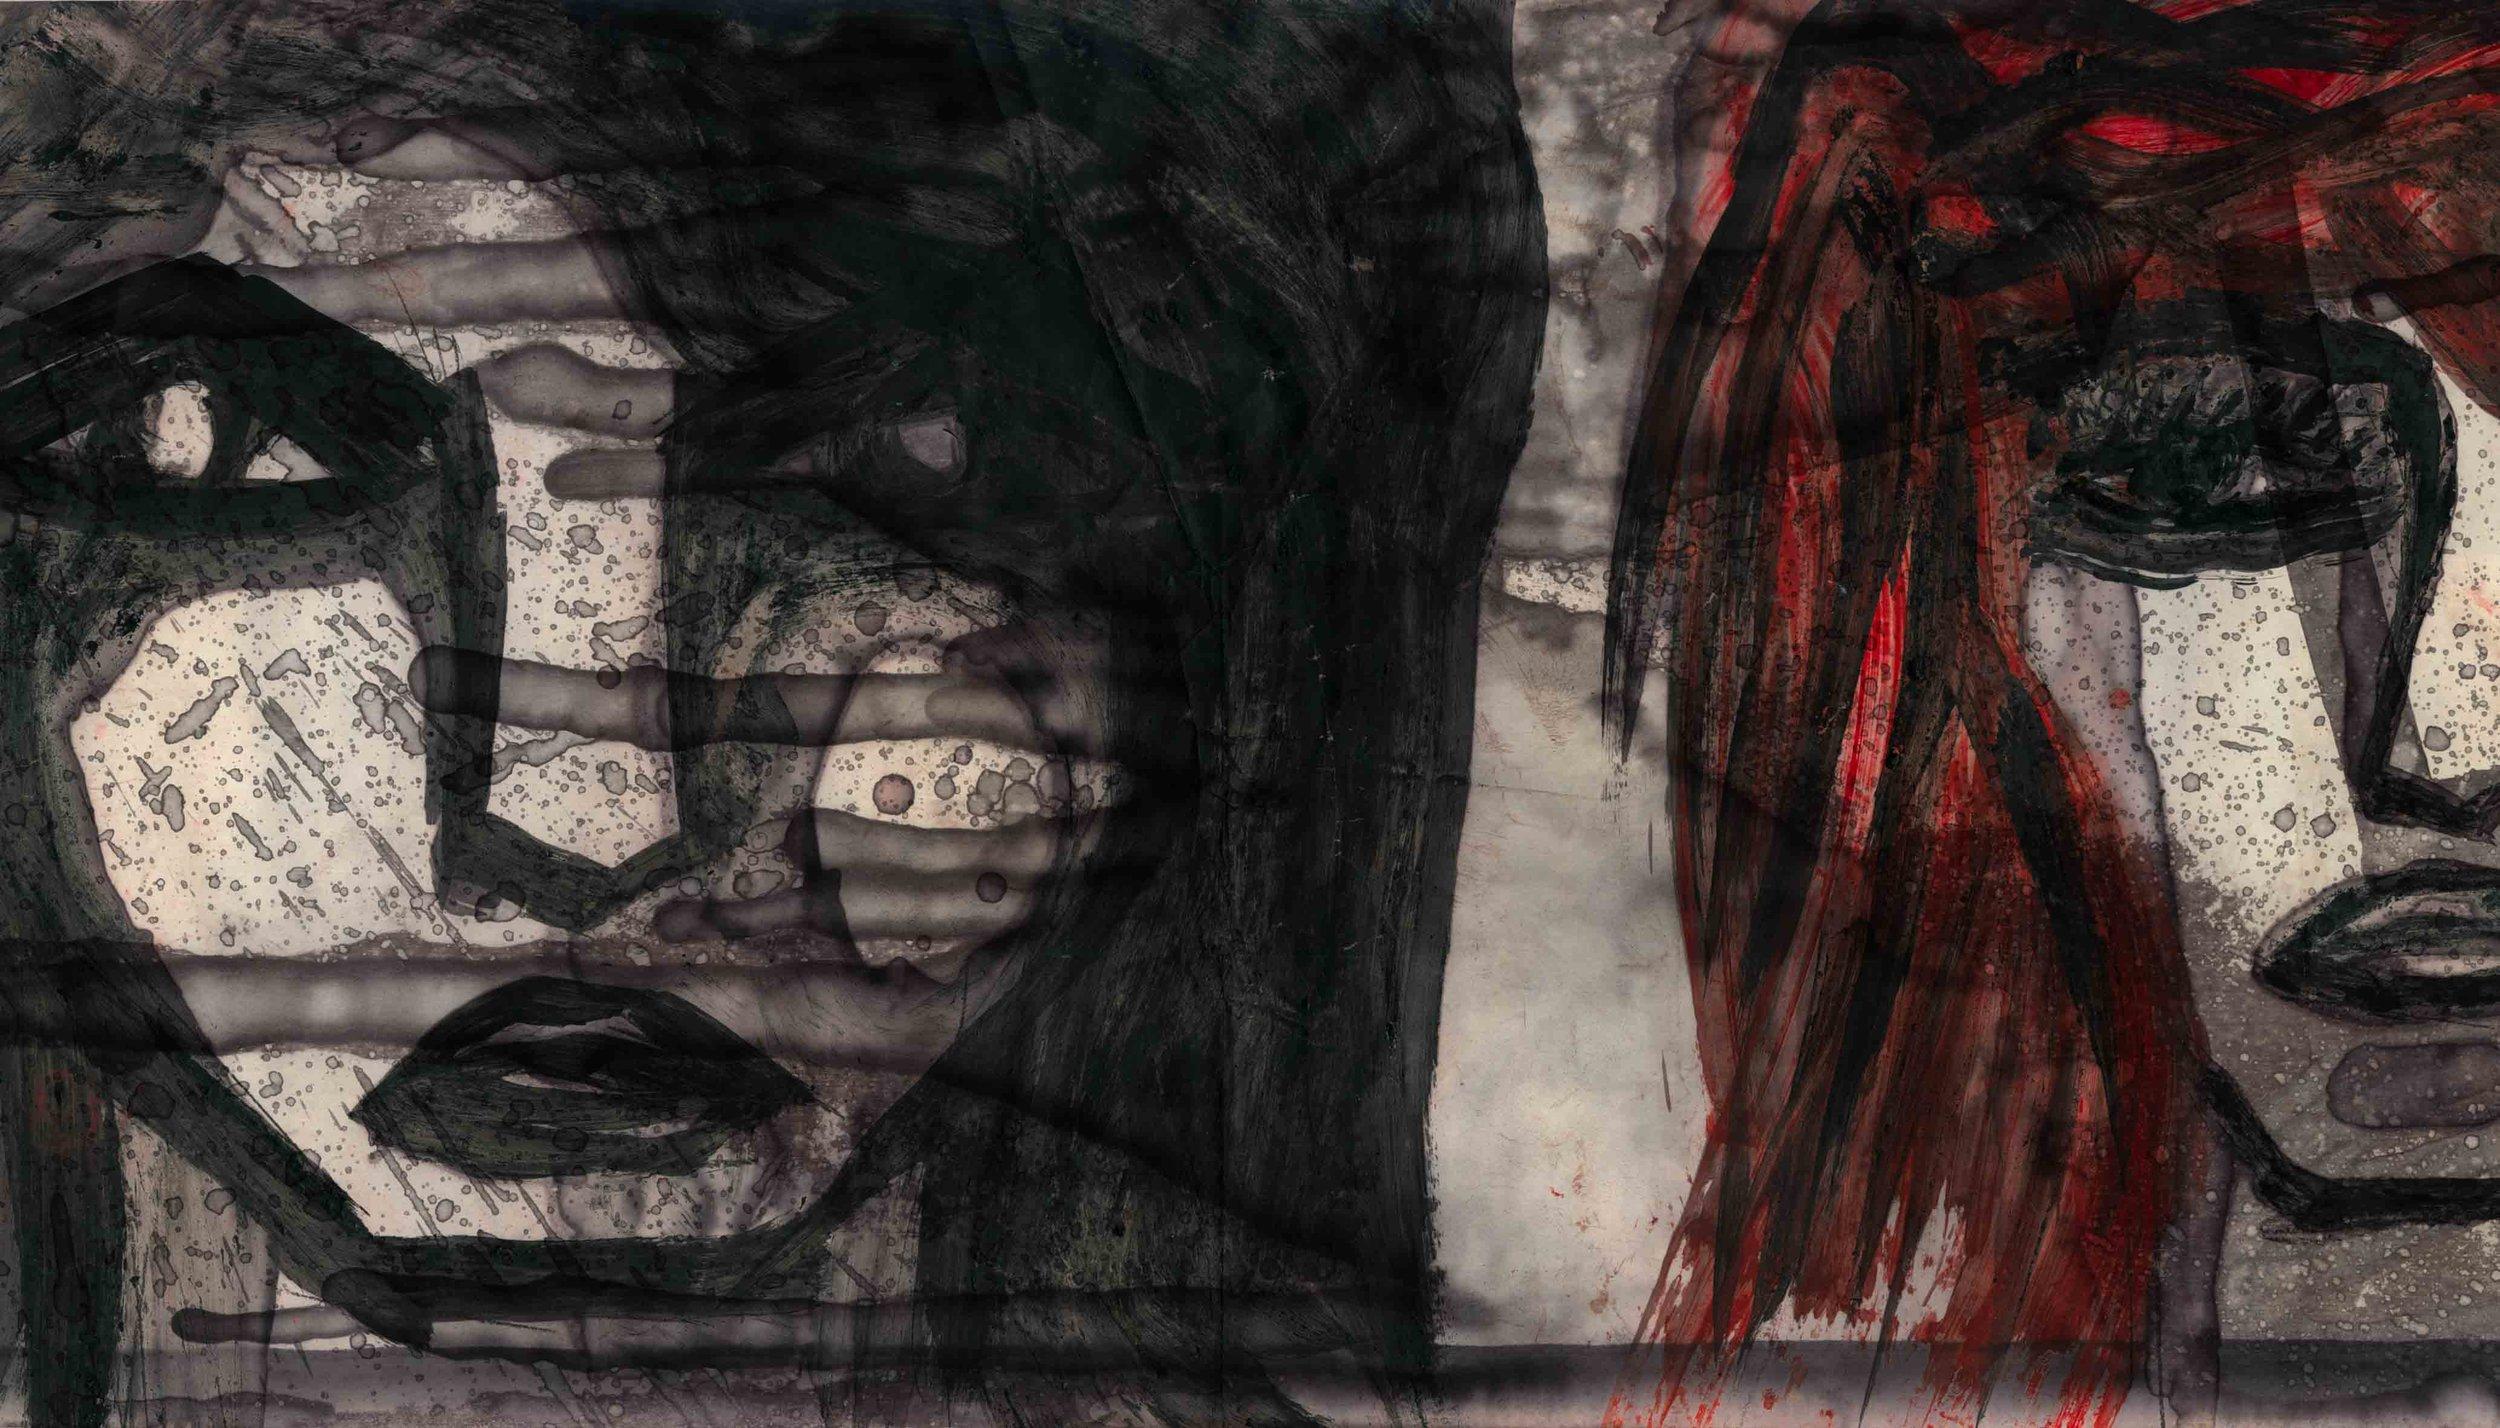 alfred_tarazi_fragments_silent_film_screen_25.jpg